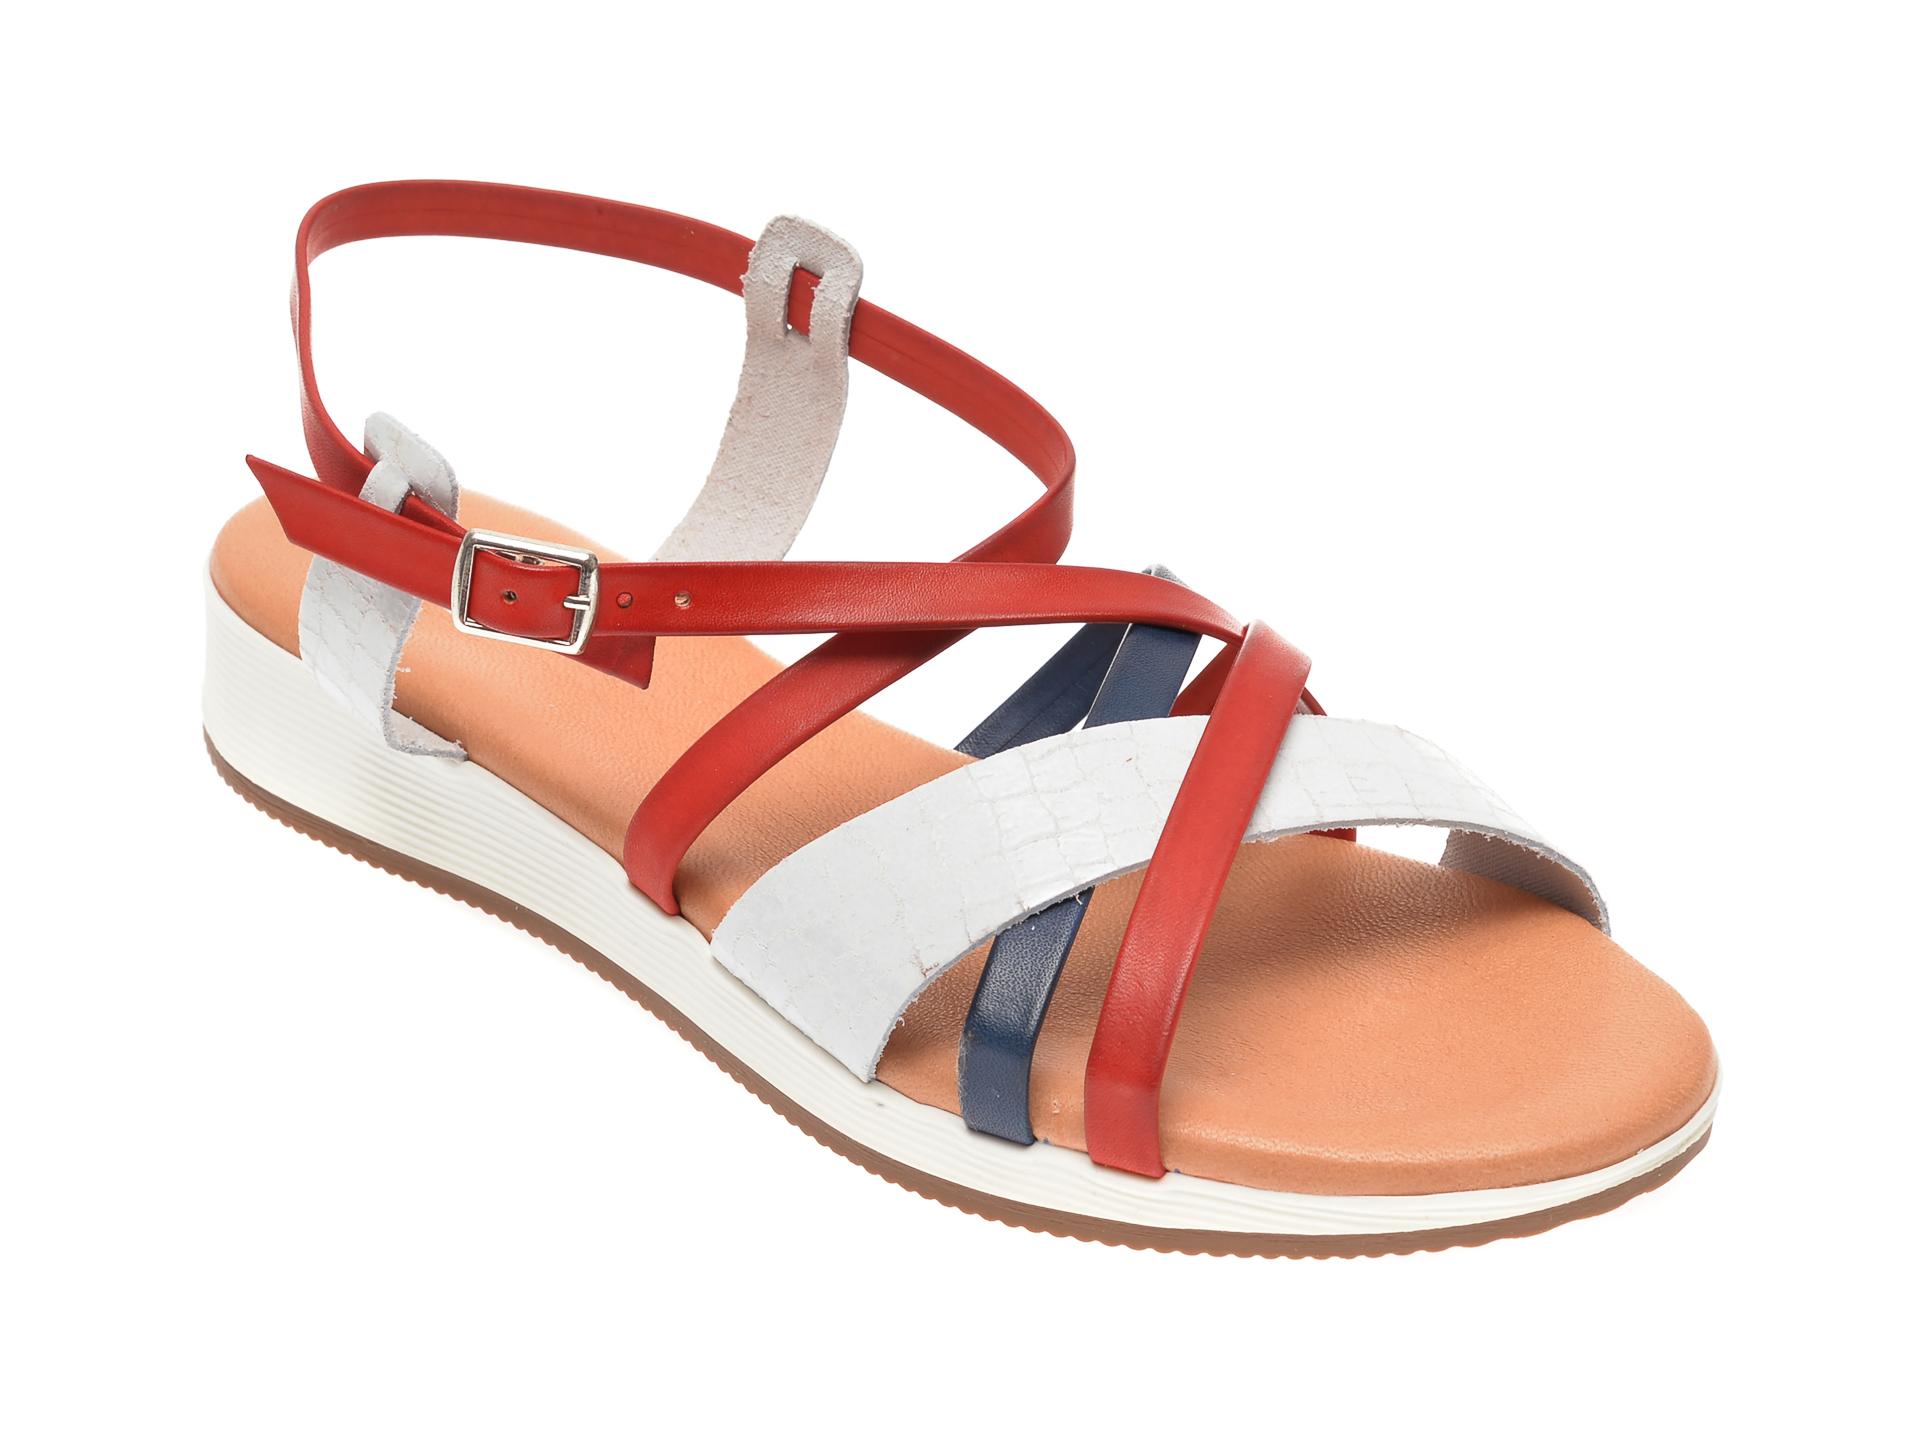 Sandale IMAGE rosii, 1351C, din piele naturala imagine